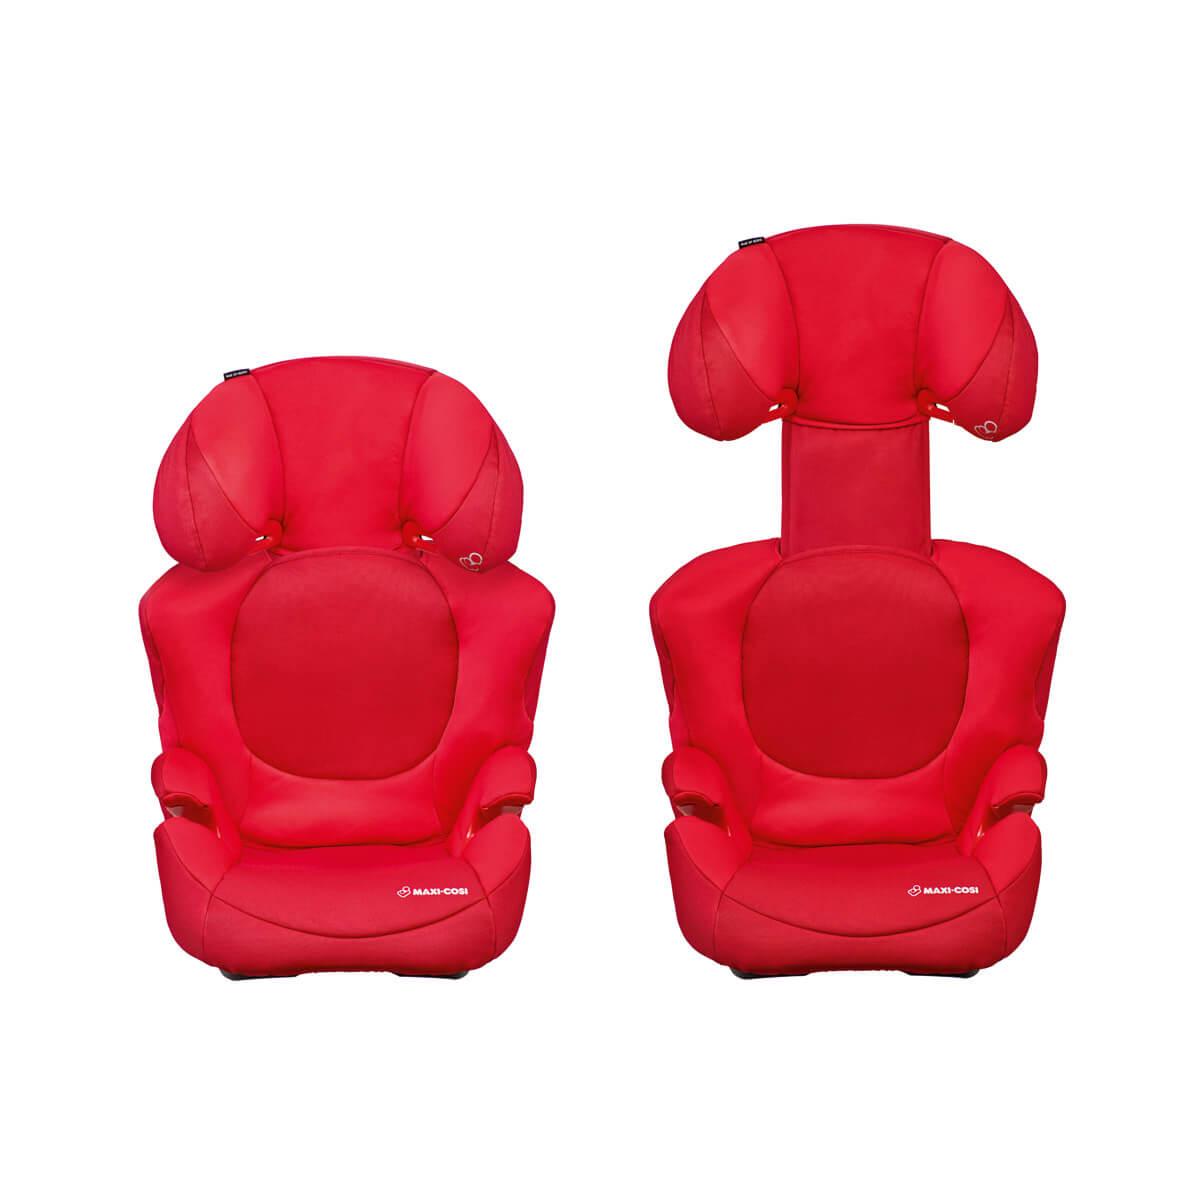 Easy headrest adjustment